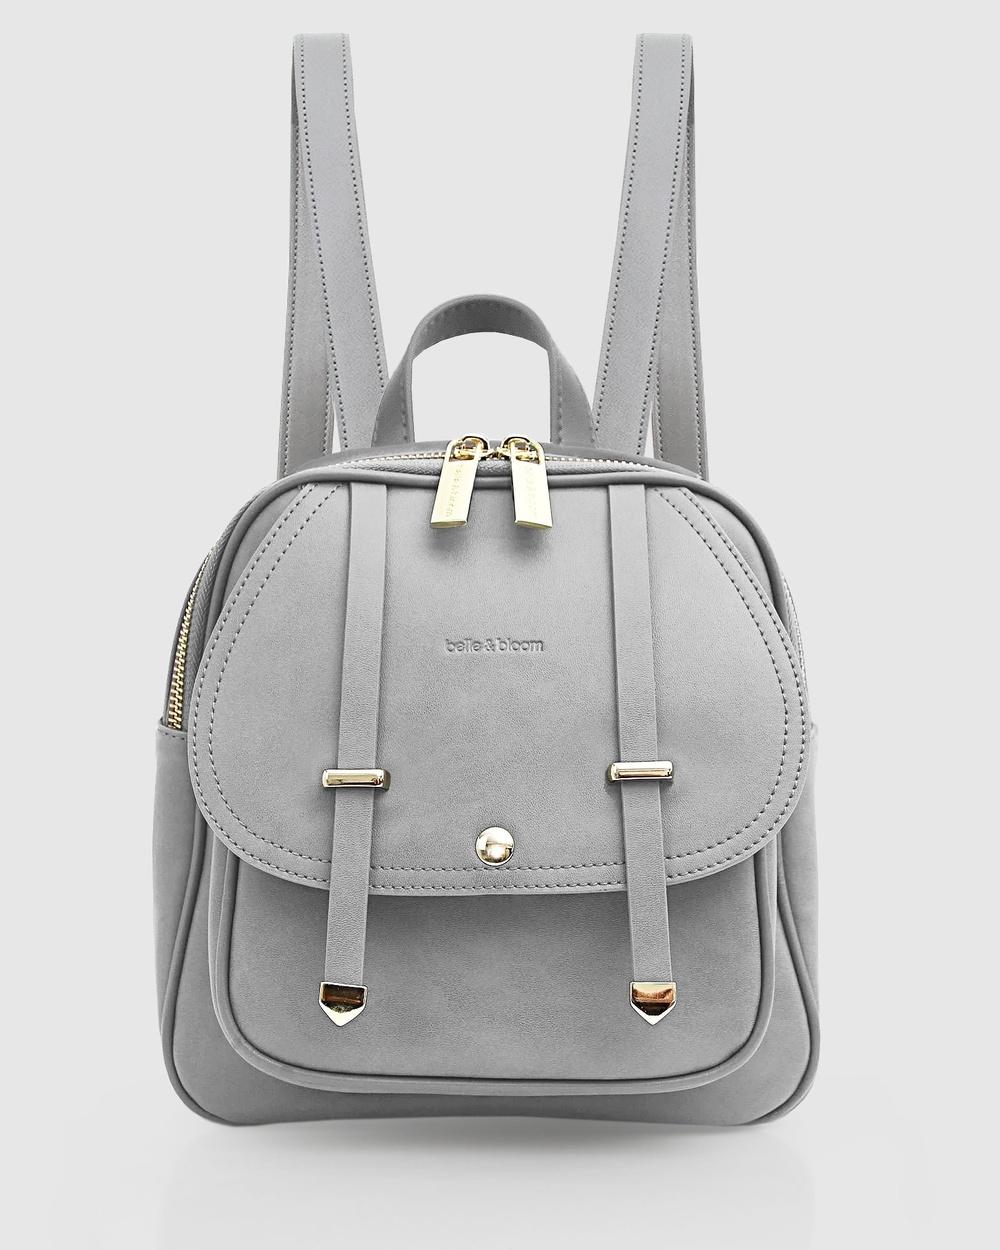 Belle & Bloom Camila Leather Backpack Backpacks Grey Leather bags Australia